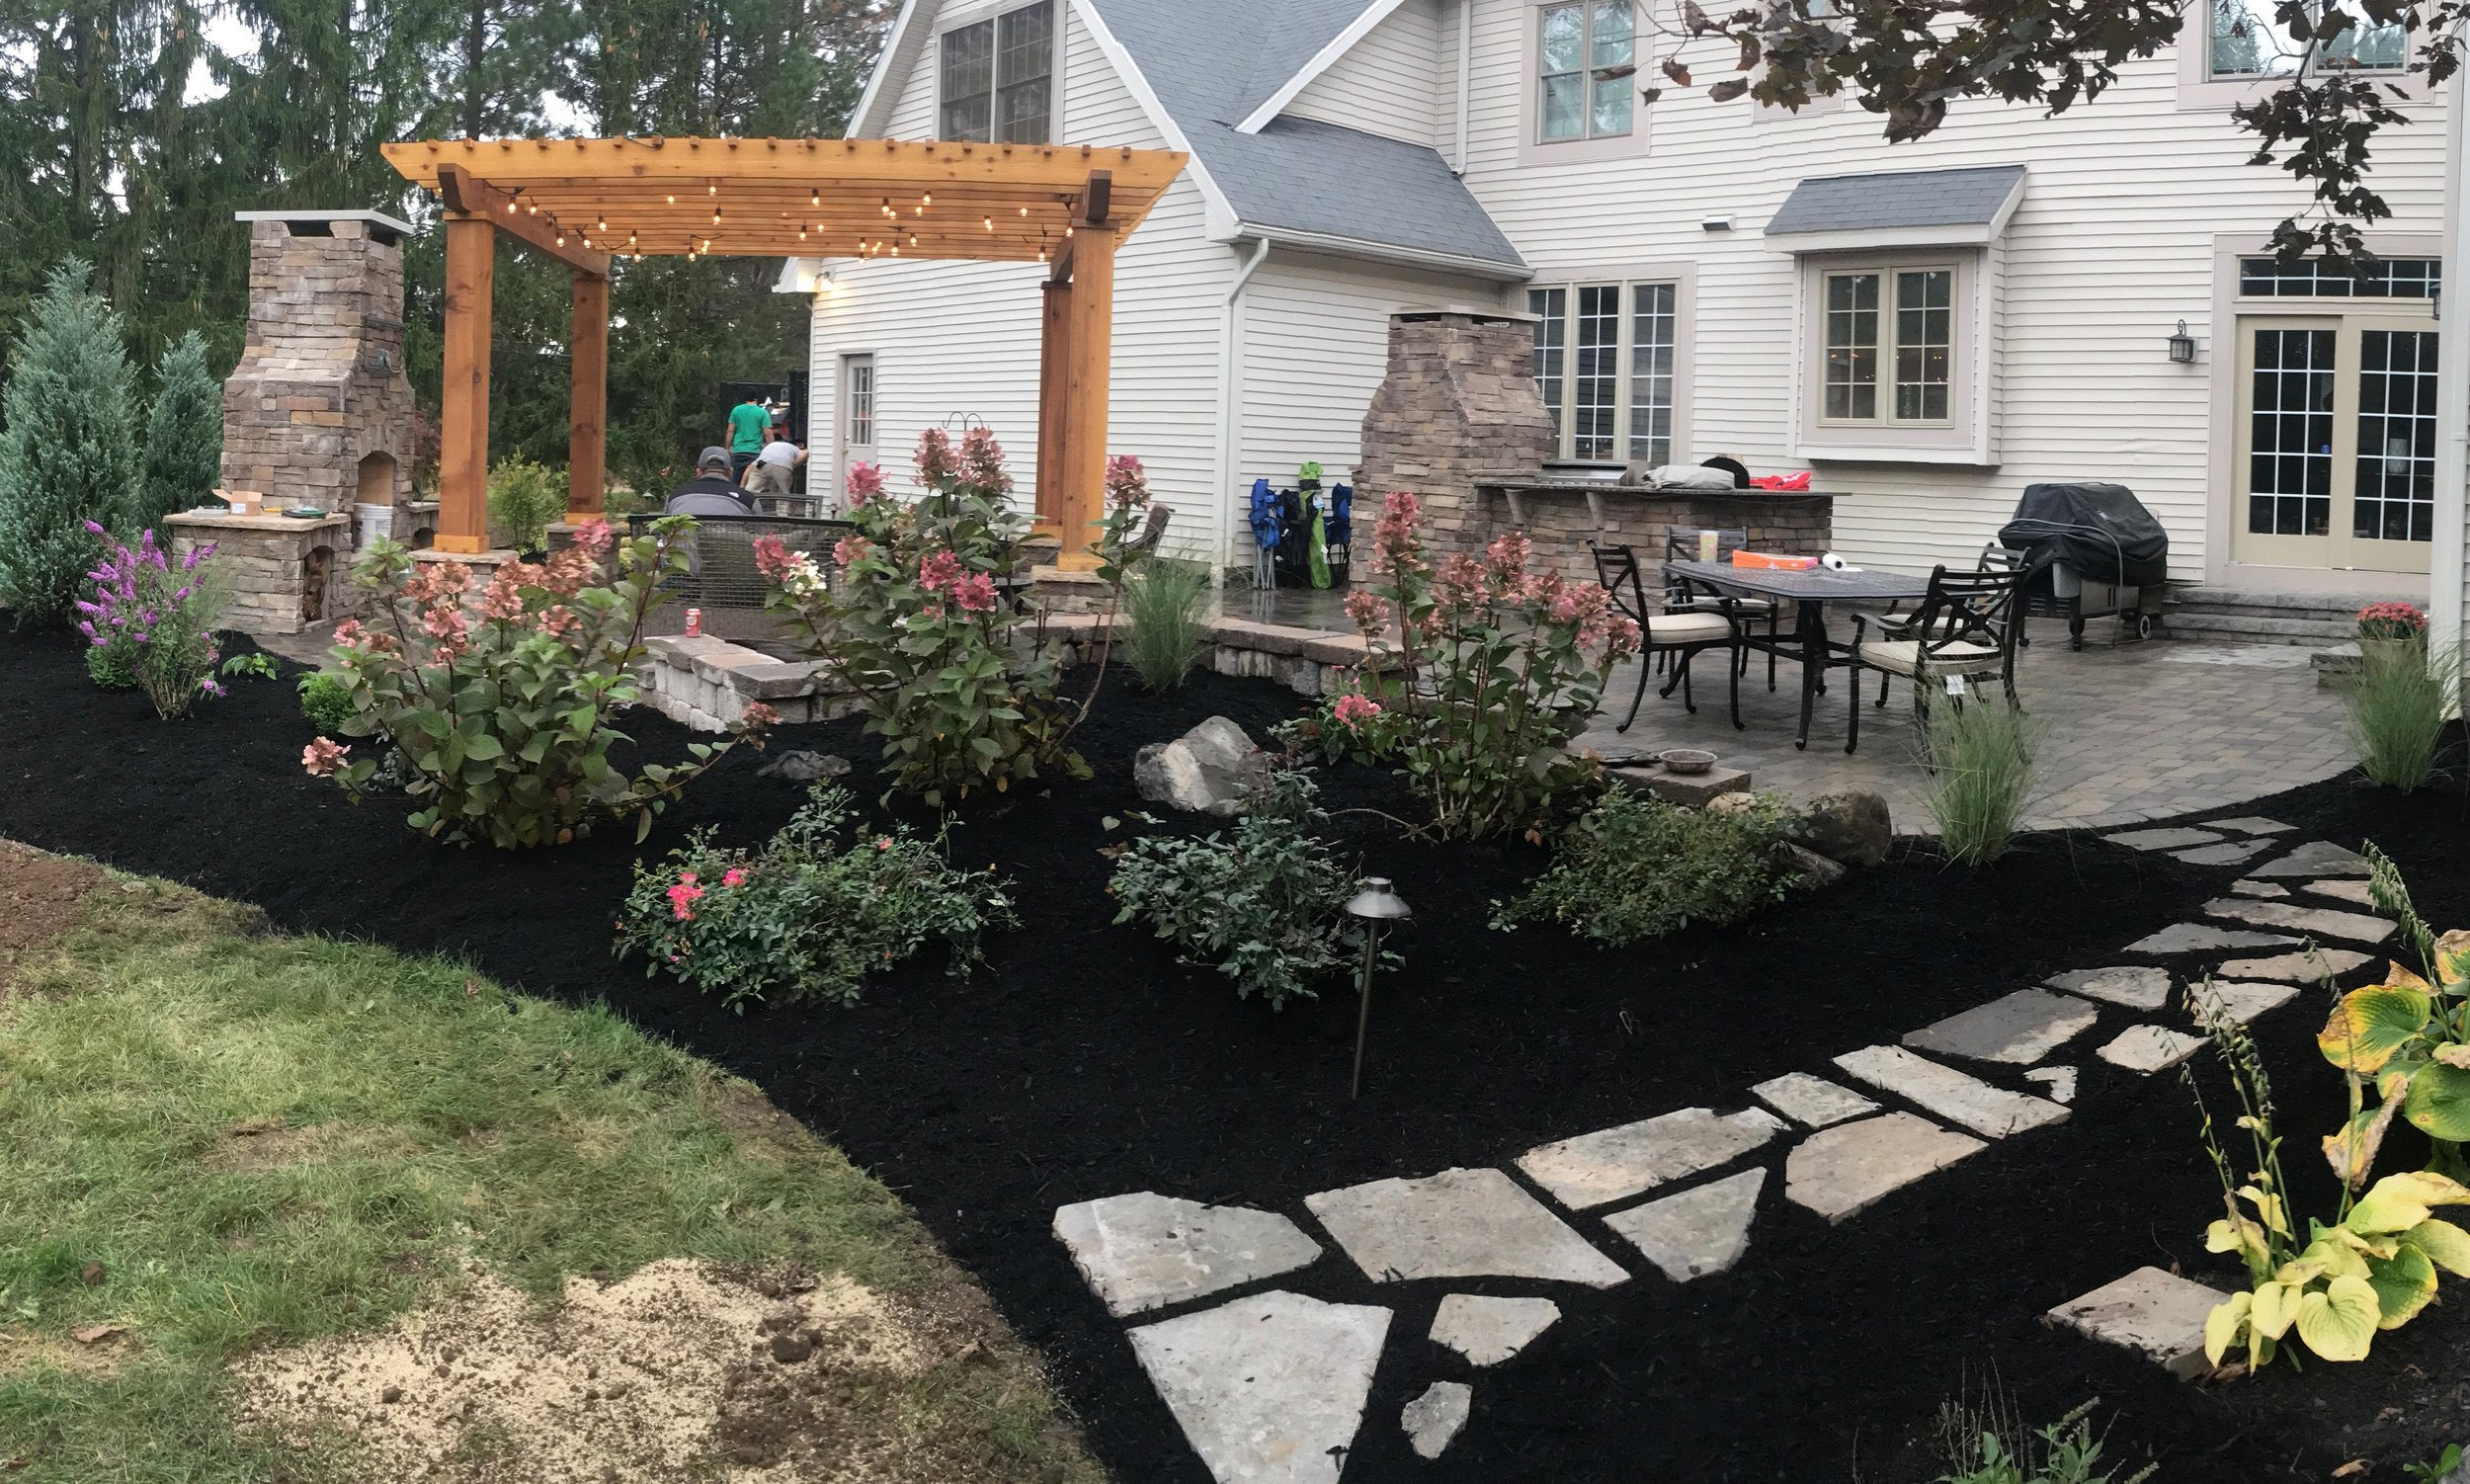 pergola patio fireplace outdoor kitchen outdoor room plantings landscape design